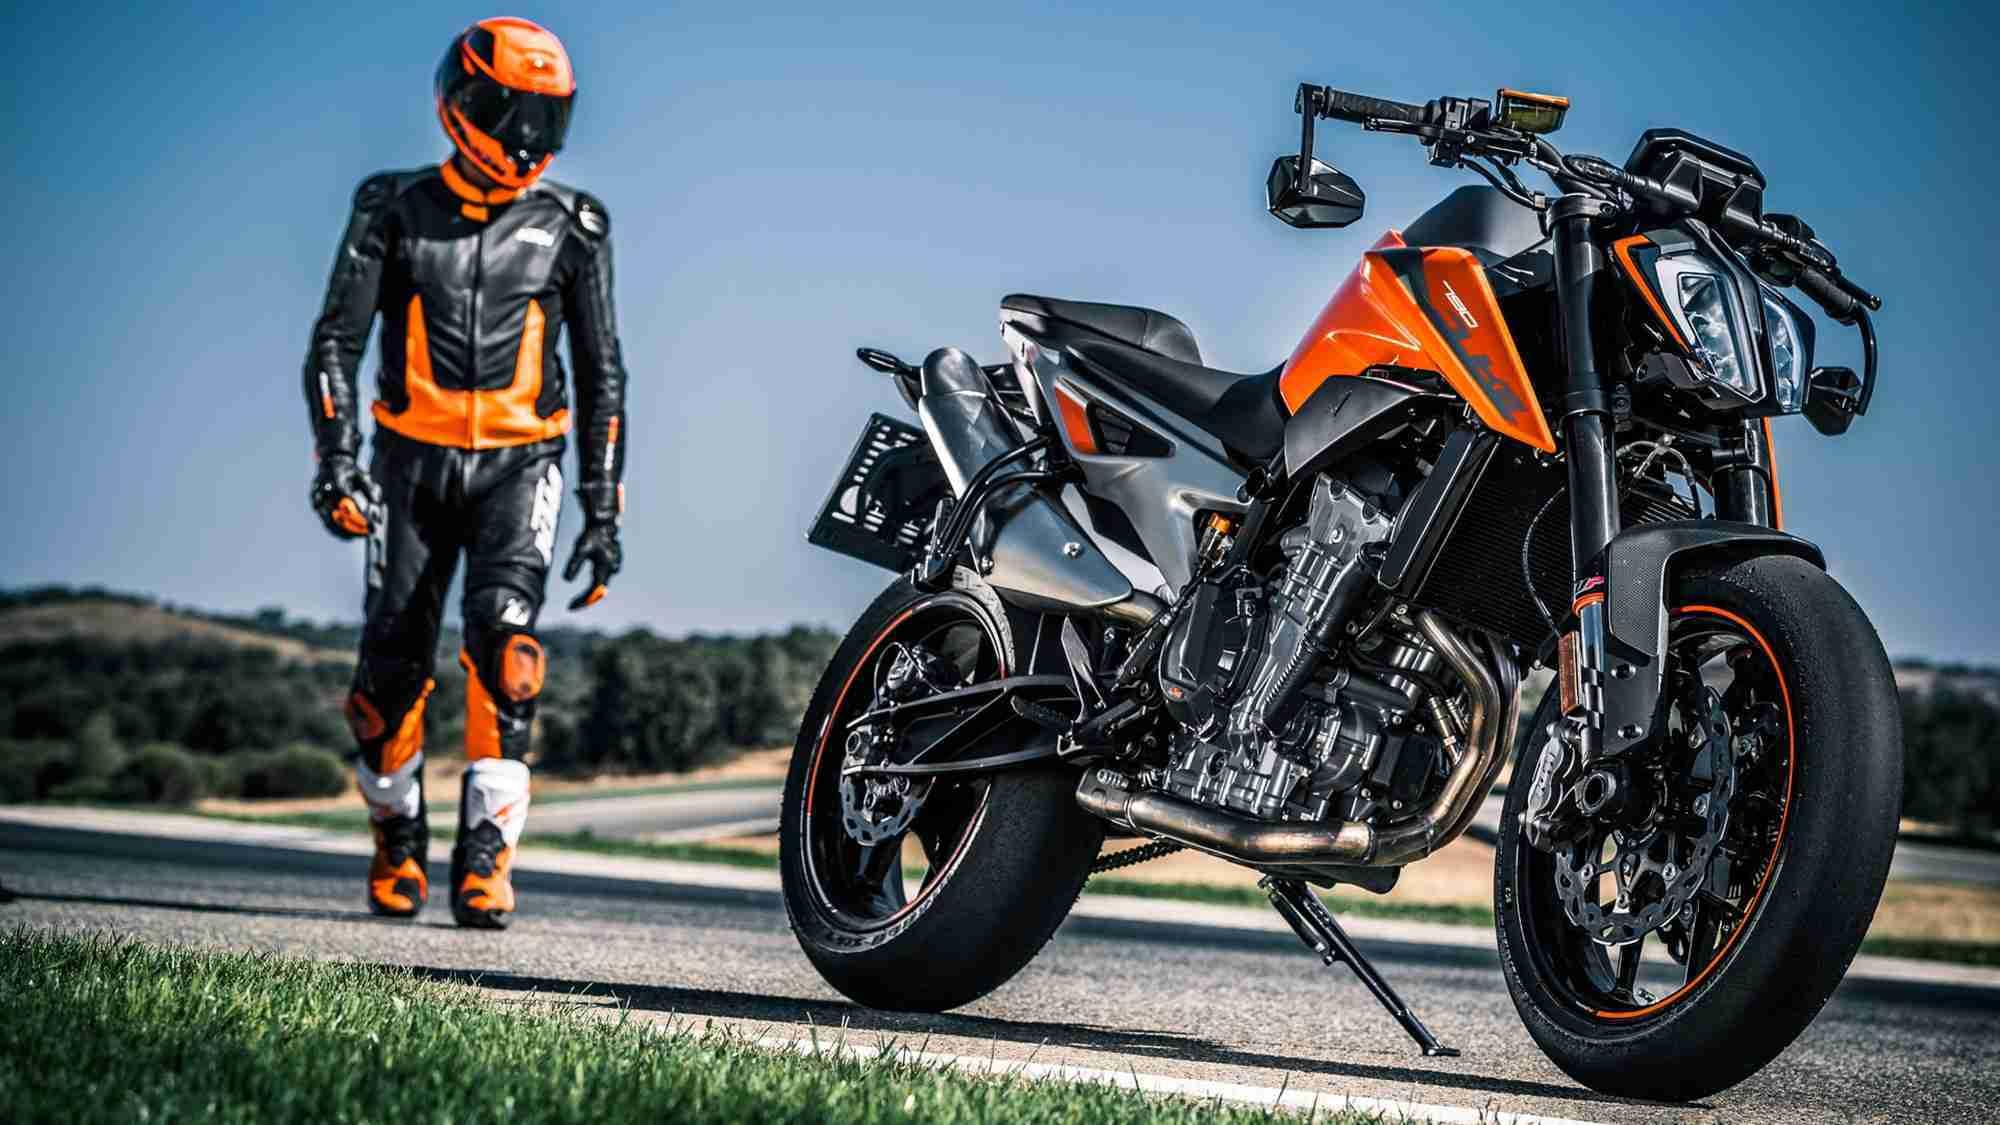 2018 KTM 790 Duke images | IAMABIKER